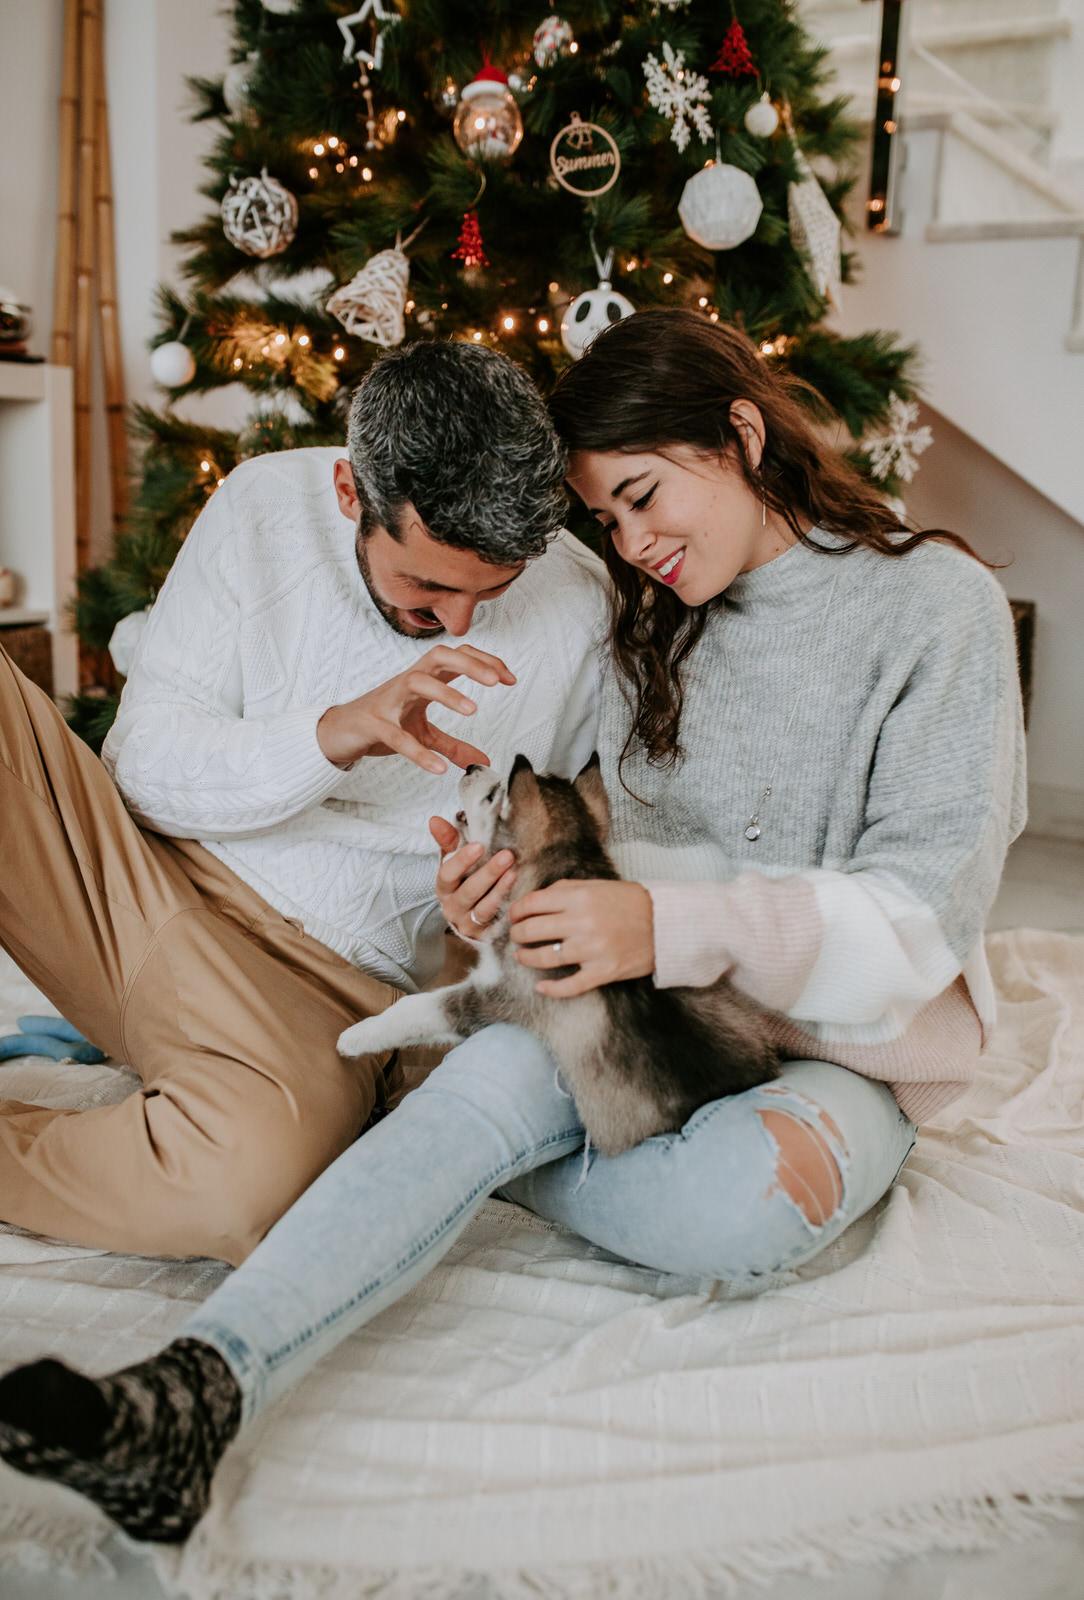 Puppy Christmas Love by  Jesús Martínez Photos